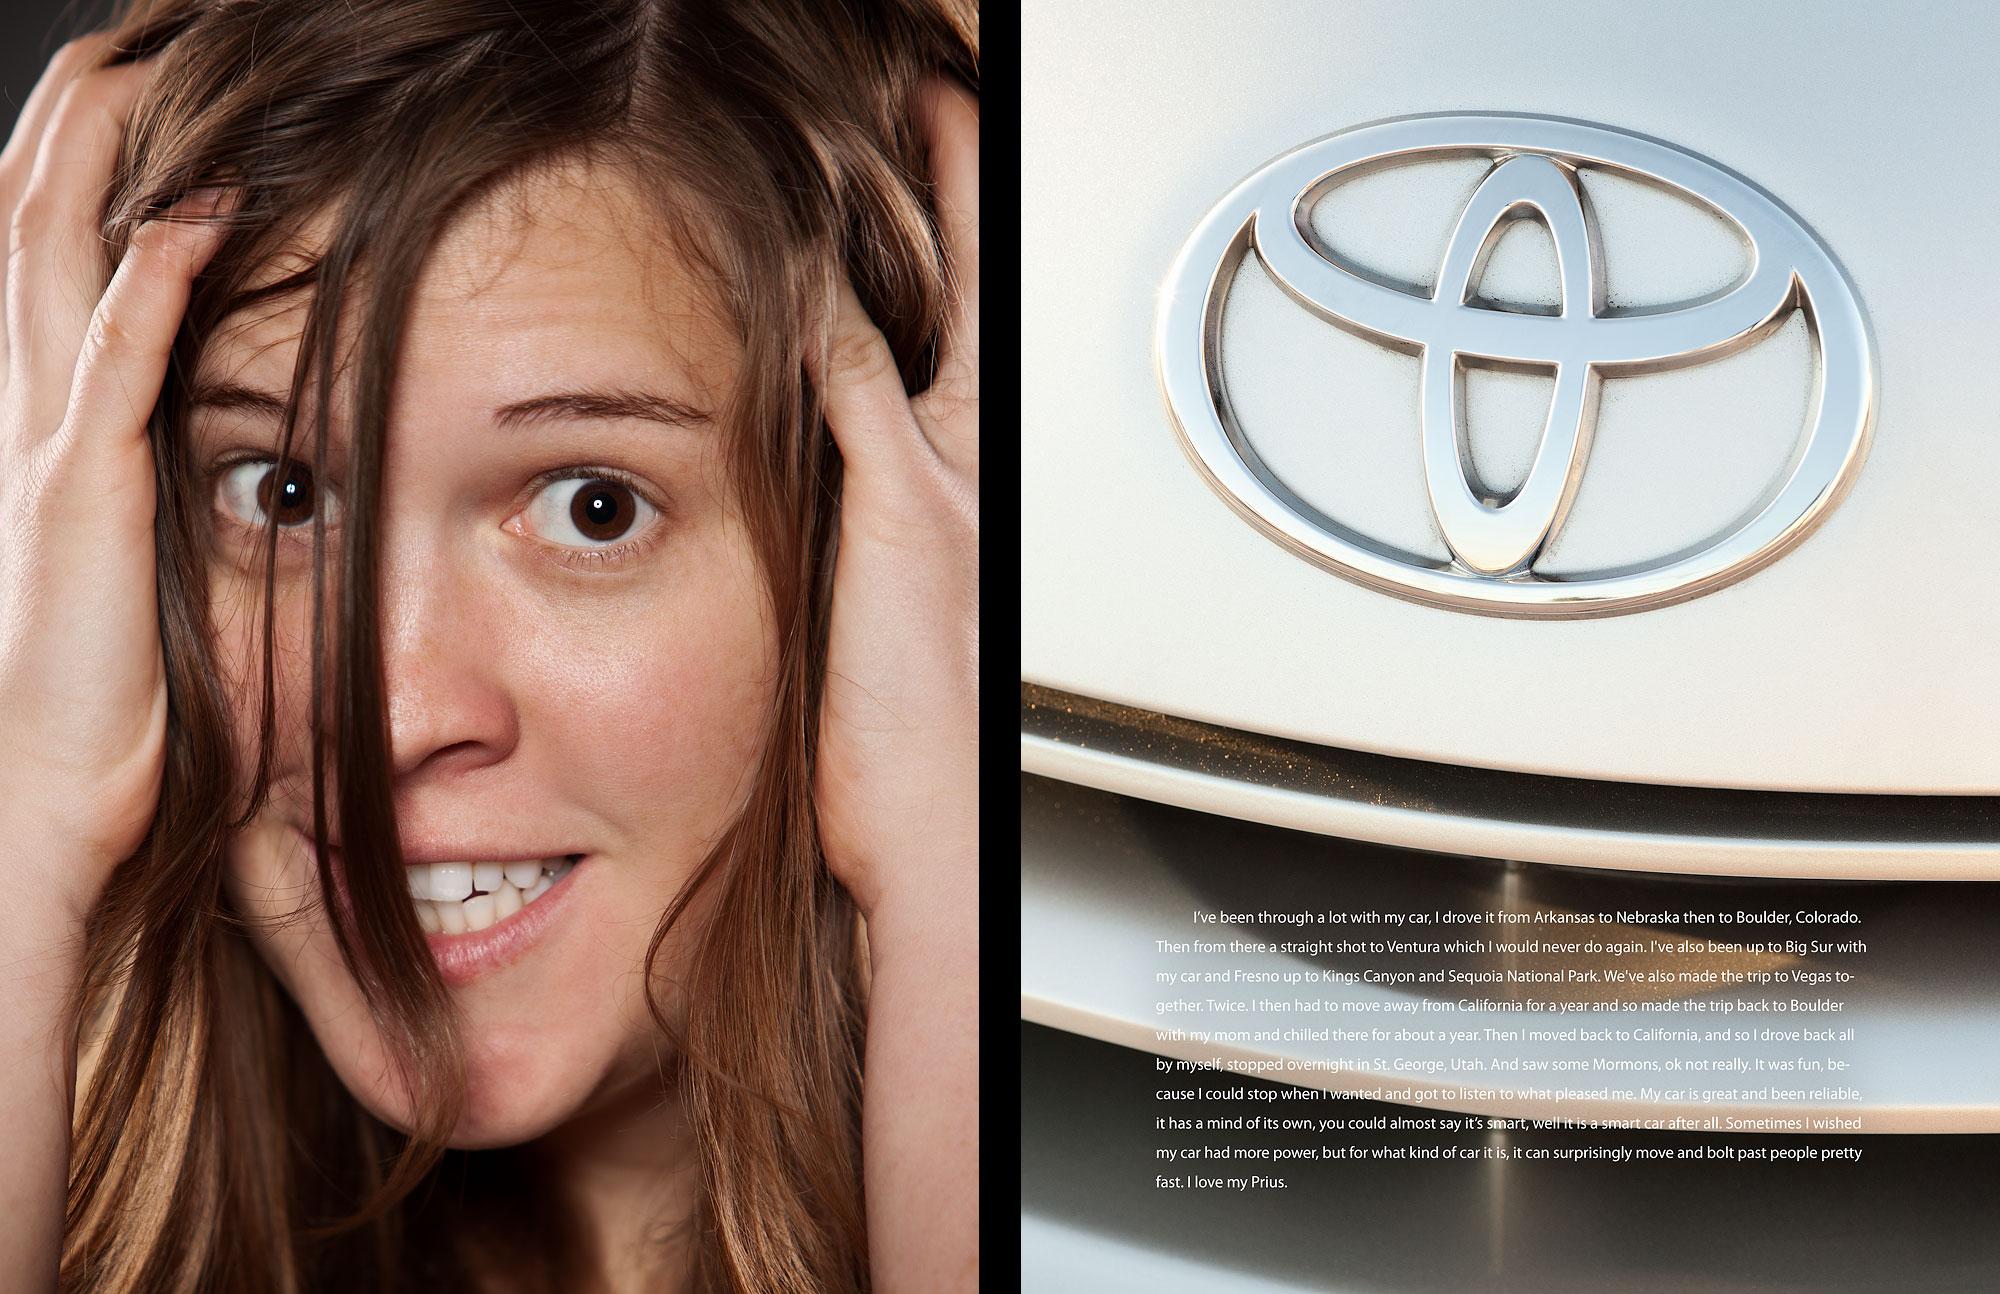 Portrait Photography I: A Dream #6 by Alex Kay